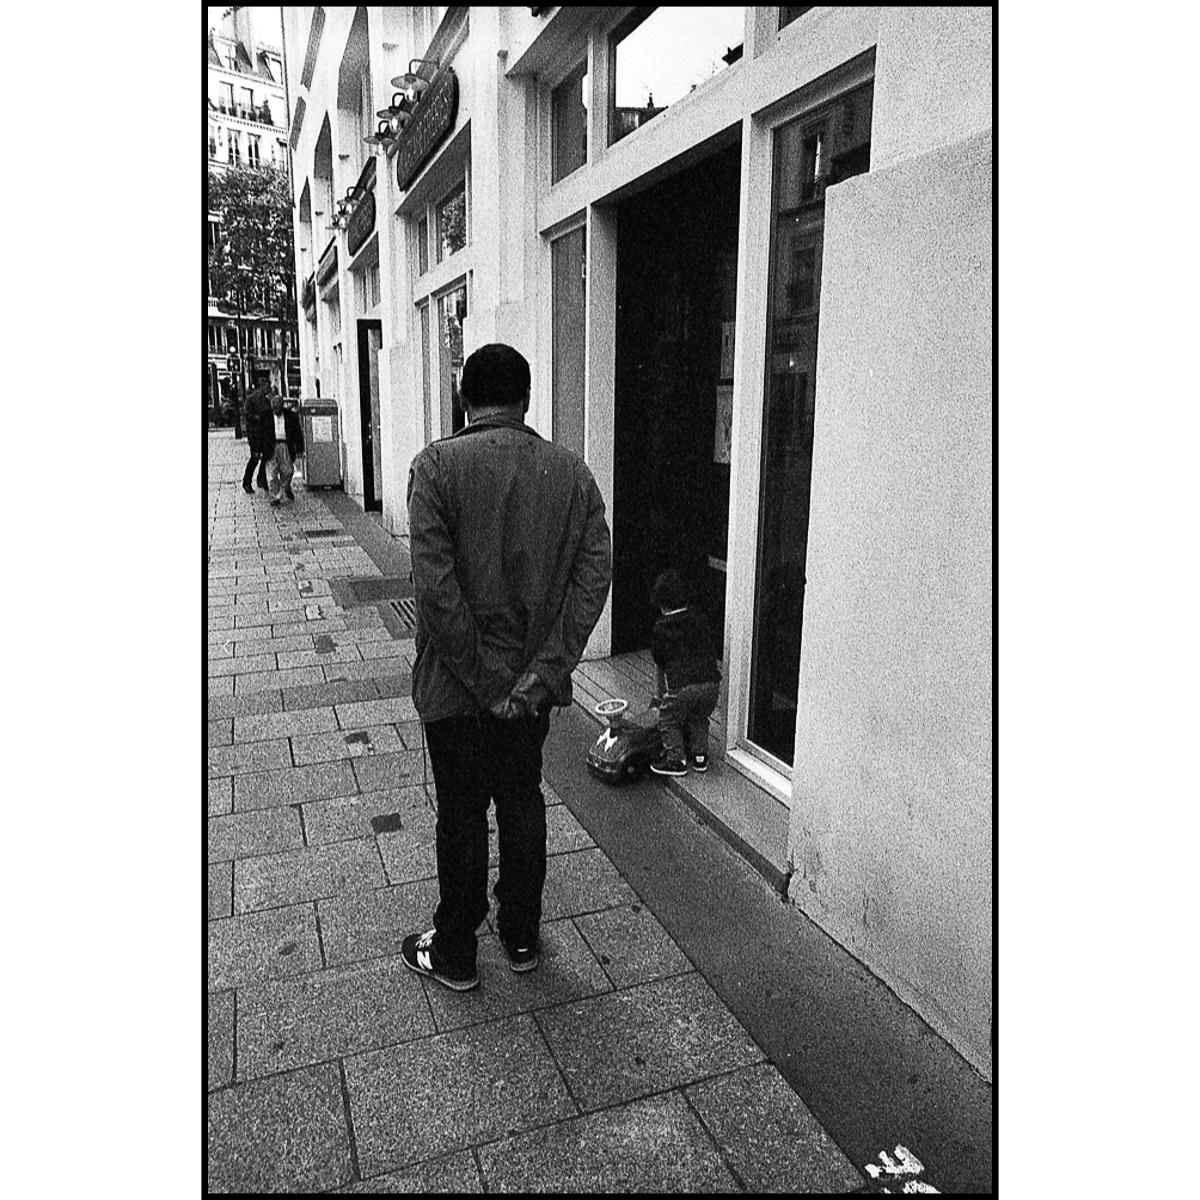 paris file-069.jpg